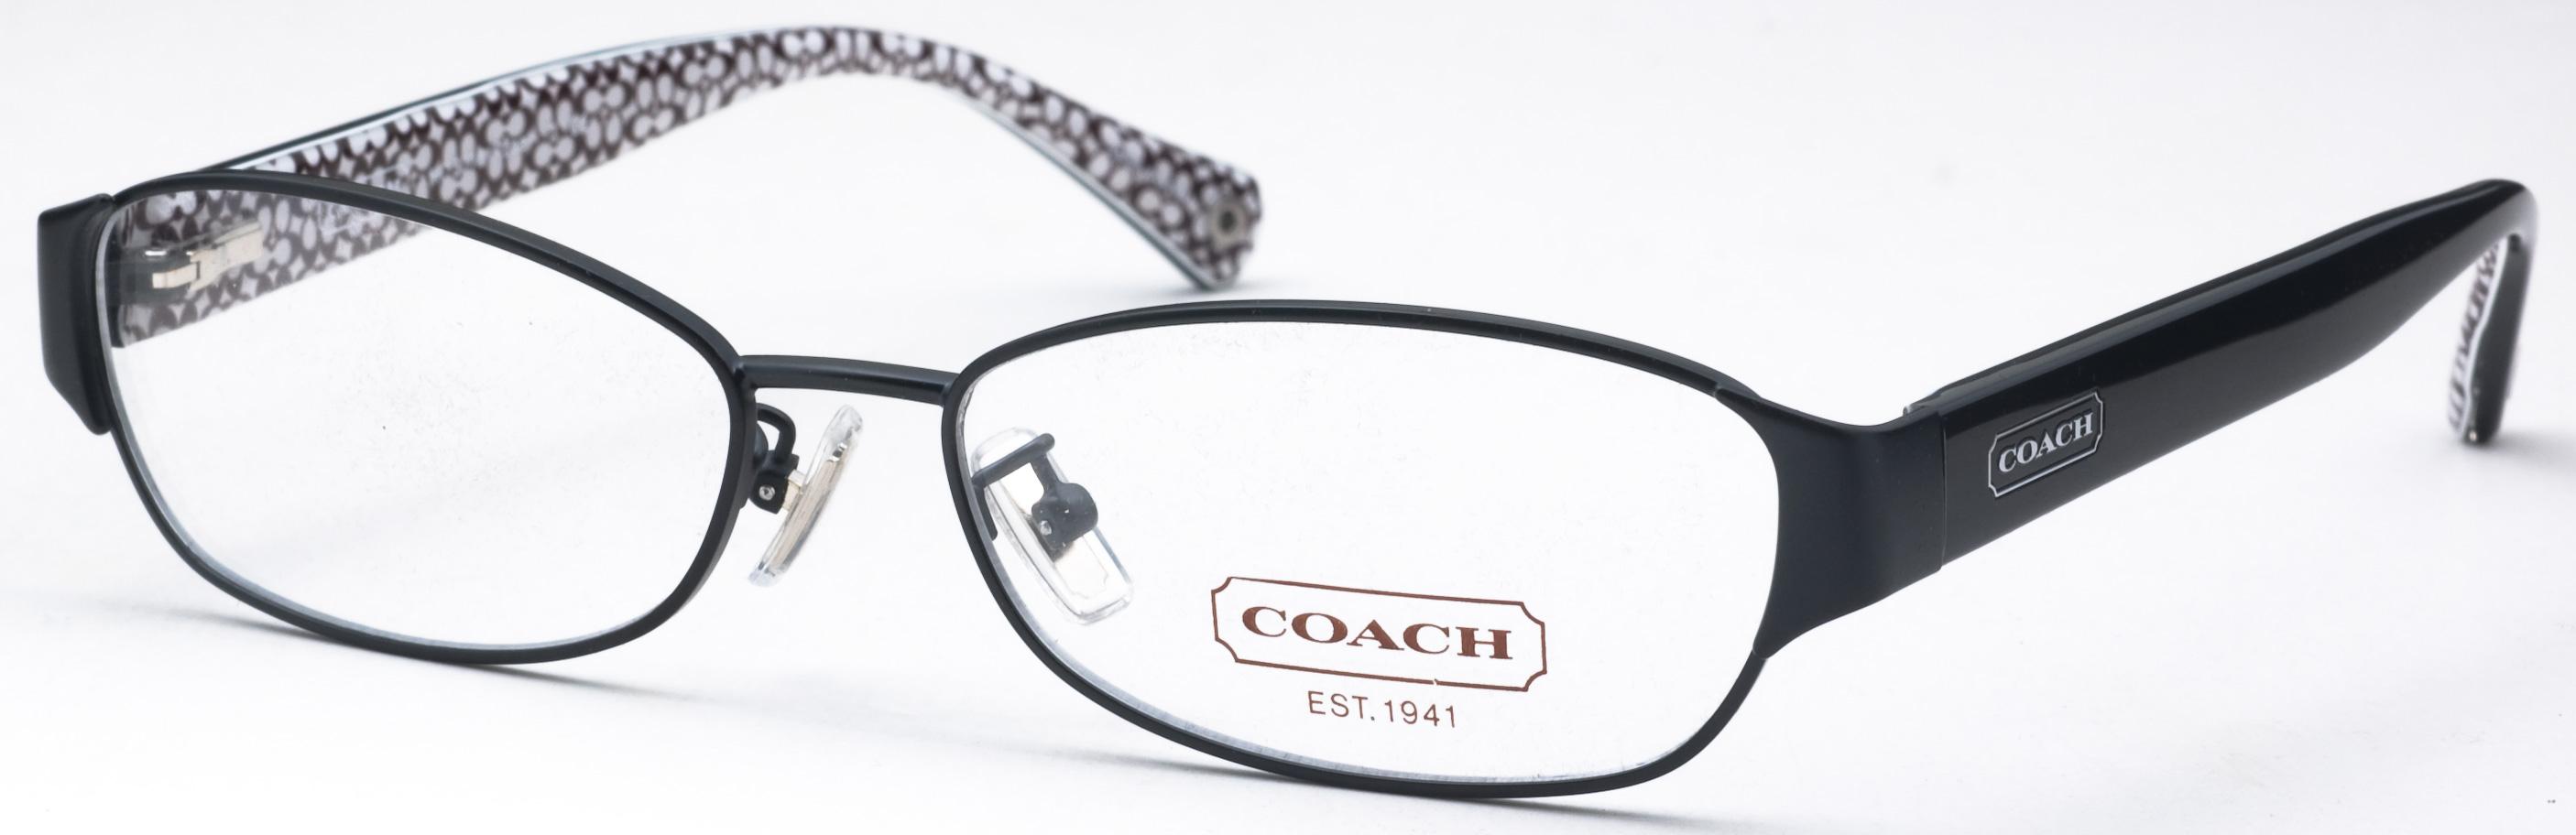 HC 5018 Eyeglasses, Black